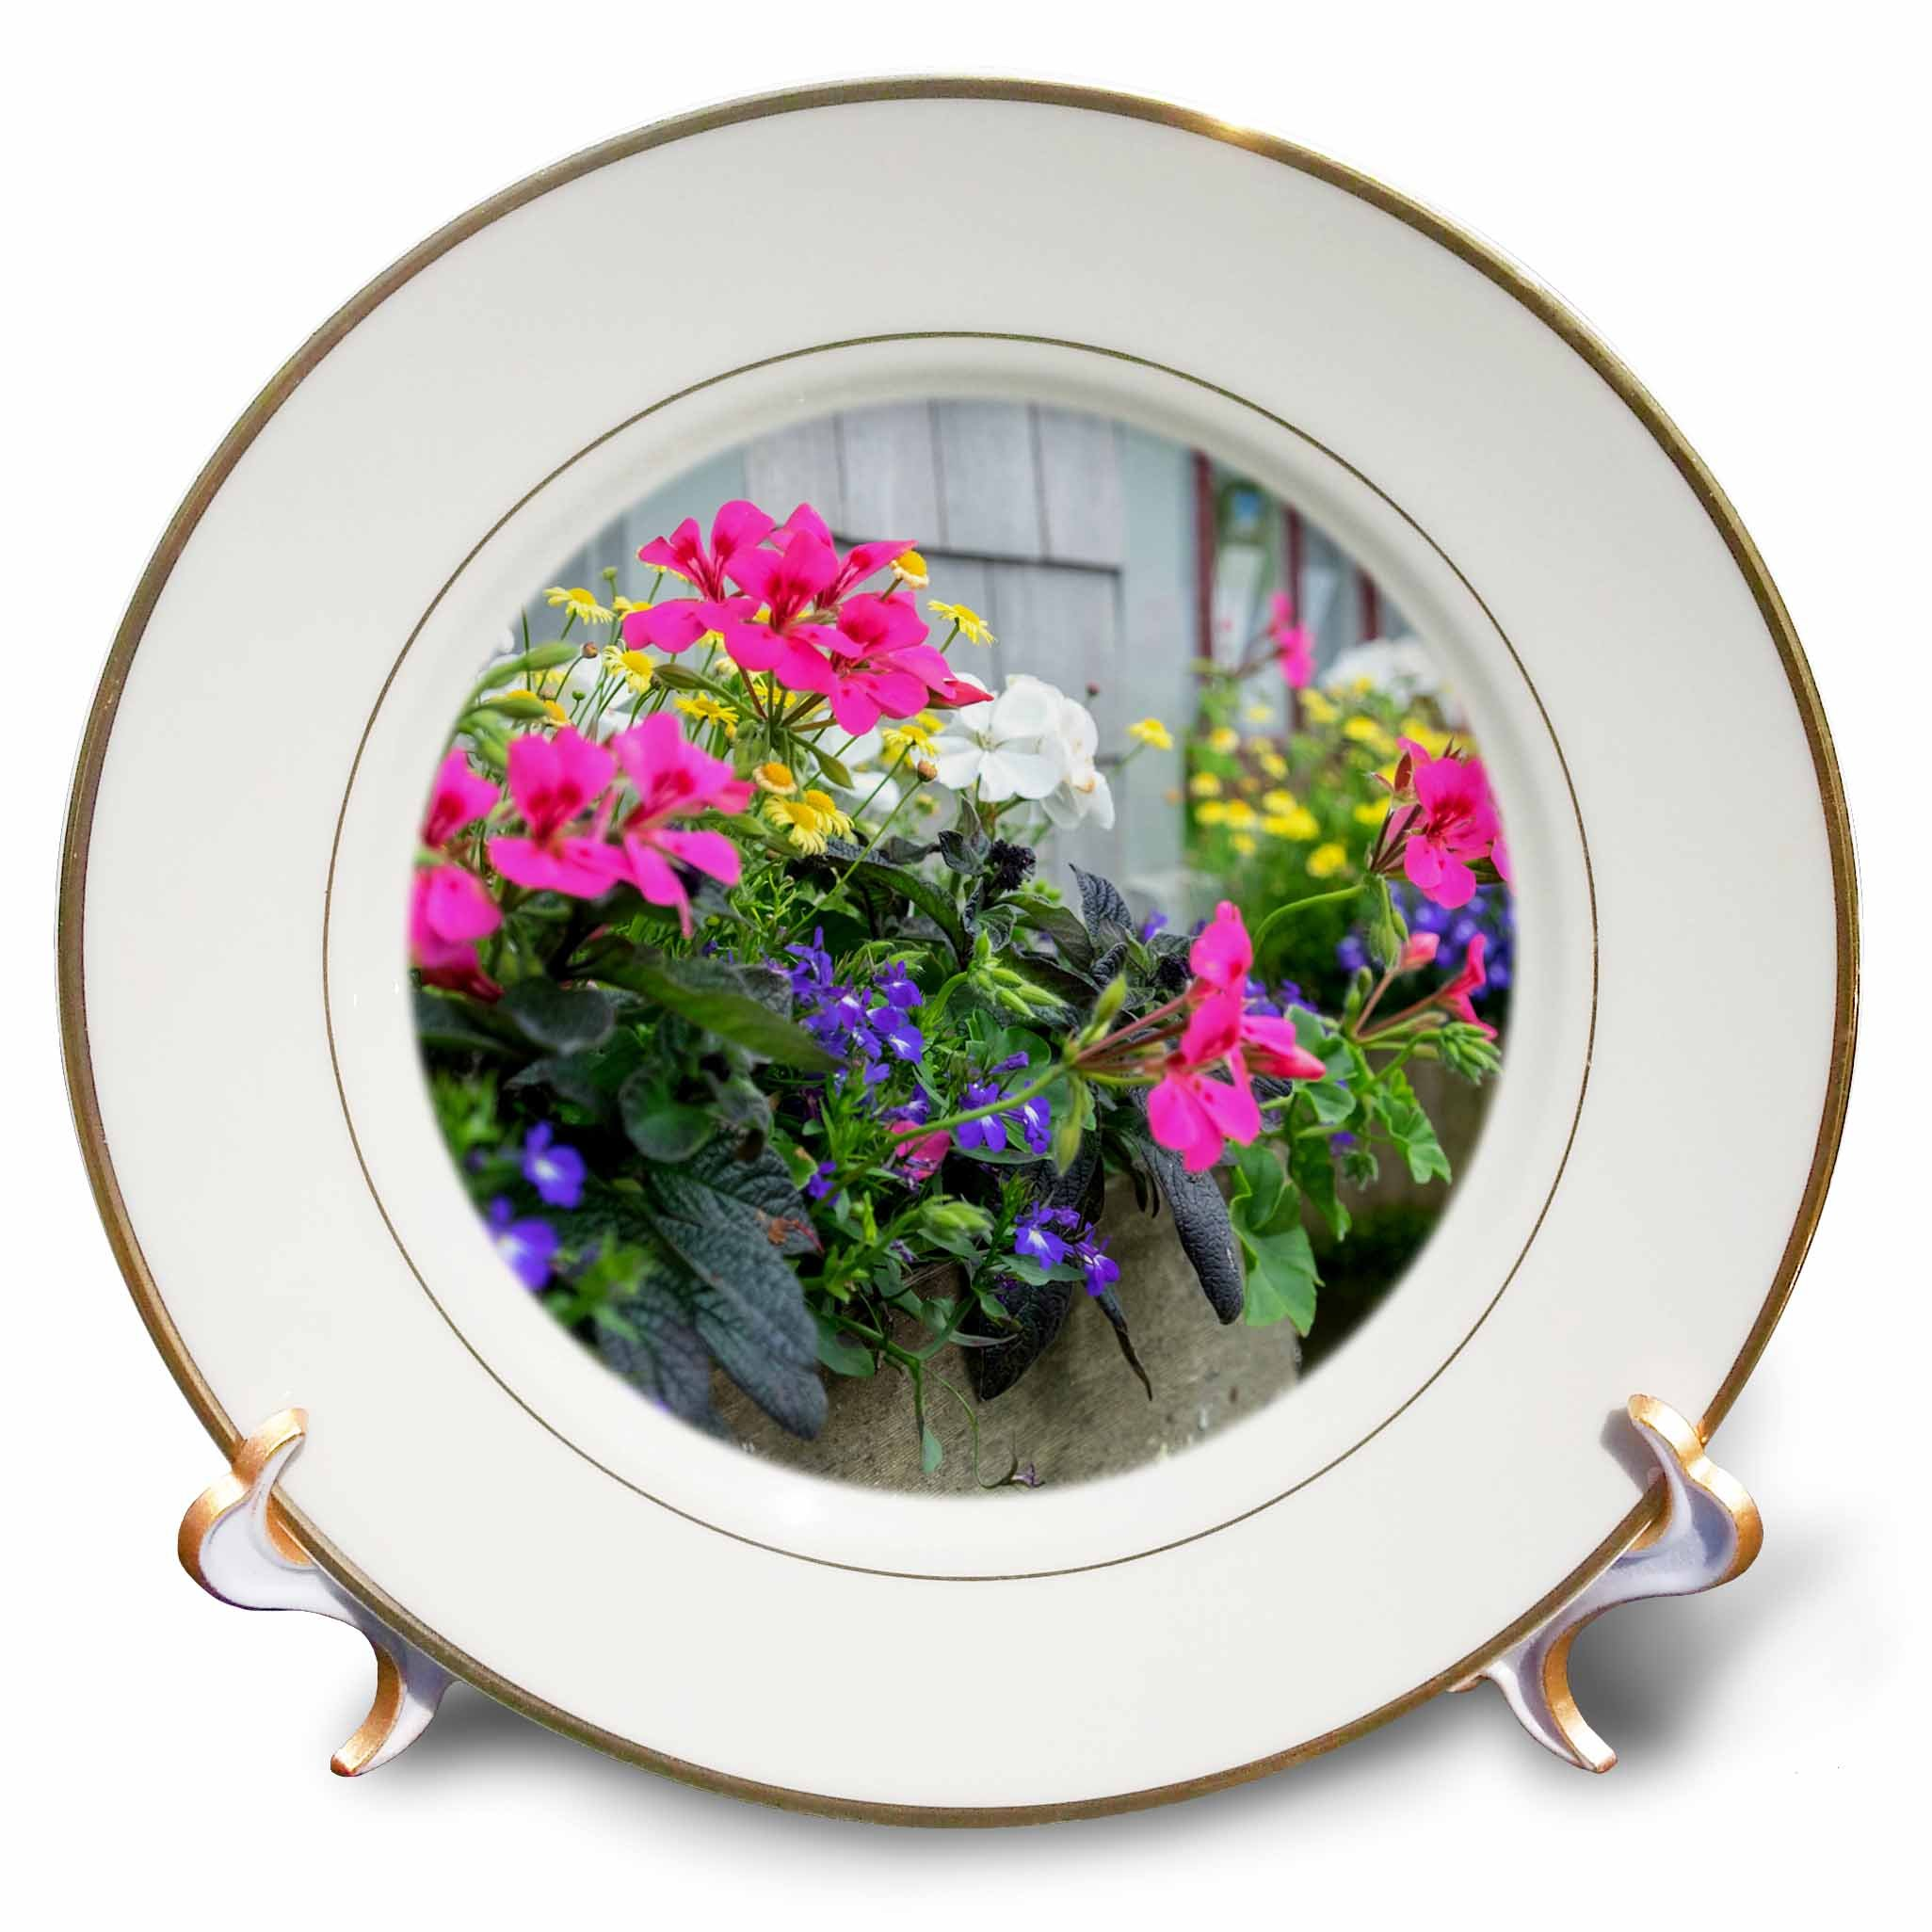 3dRose Danita Delimont - Flowers - Flowers in window boxes, Nantucket, Massachusetts, USA - 8 inch Porcelain Plate (cp_279042_1)